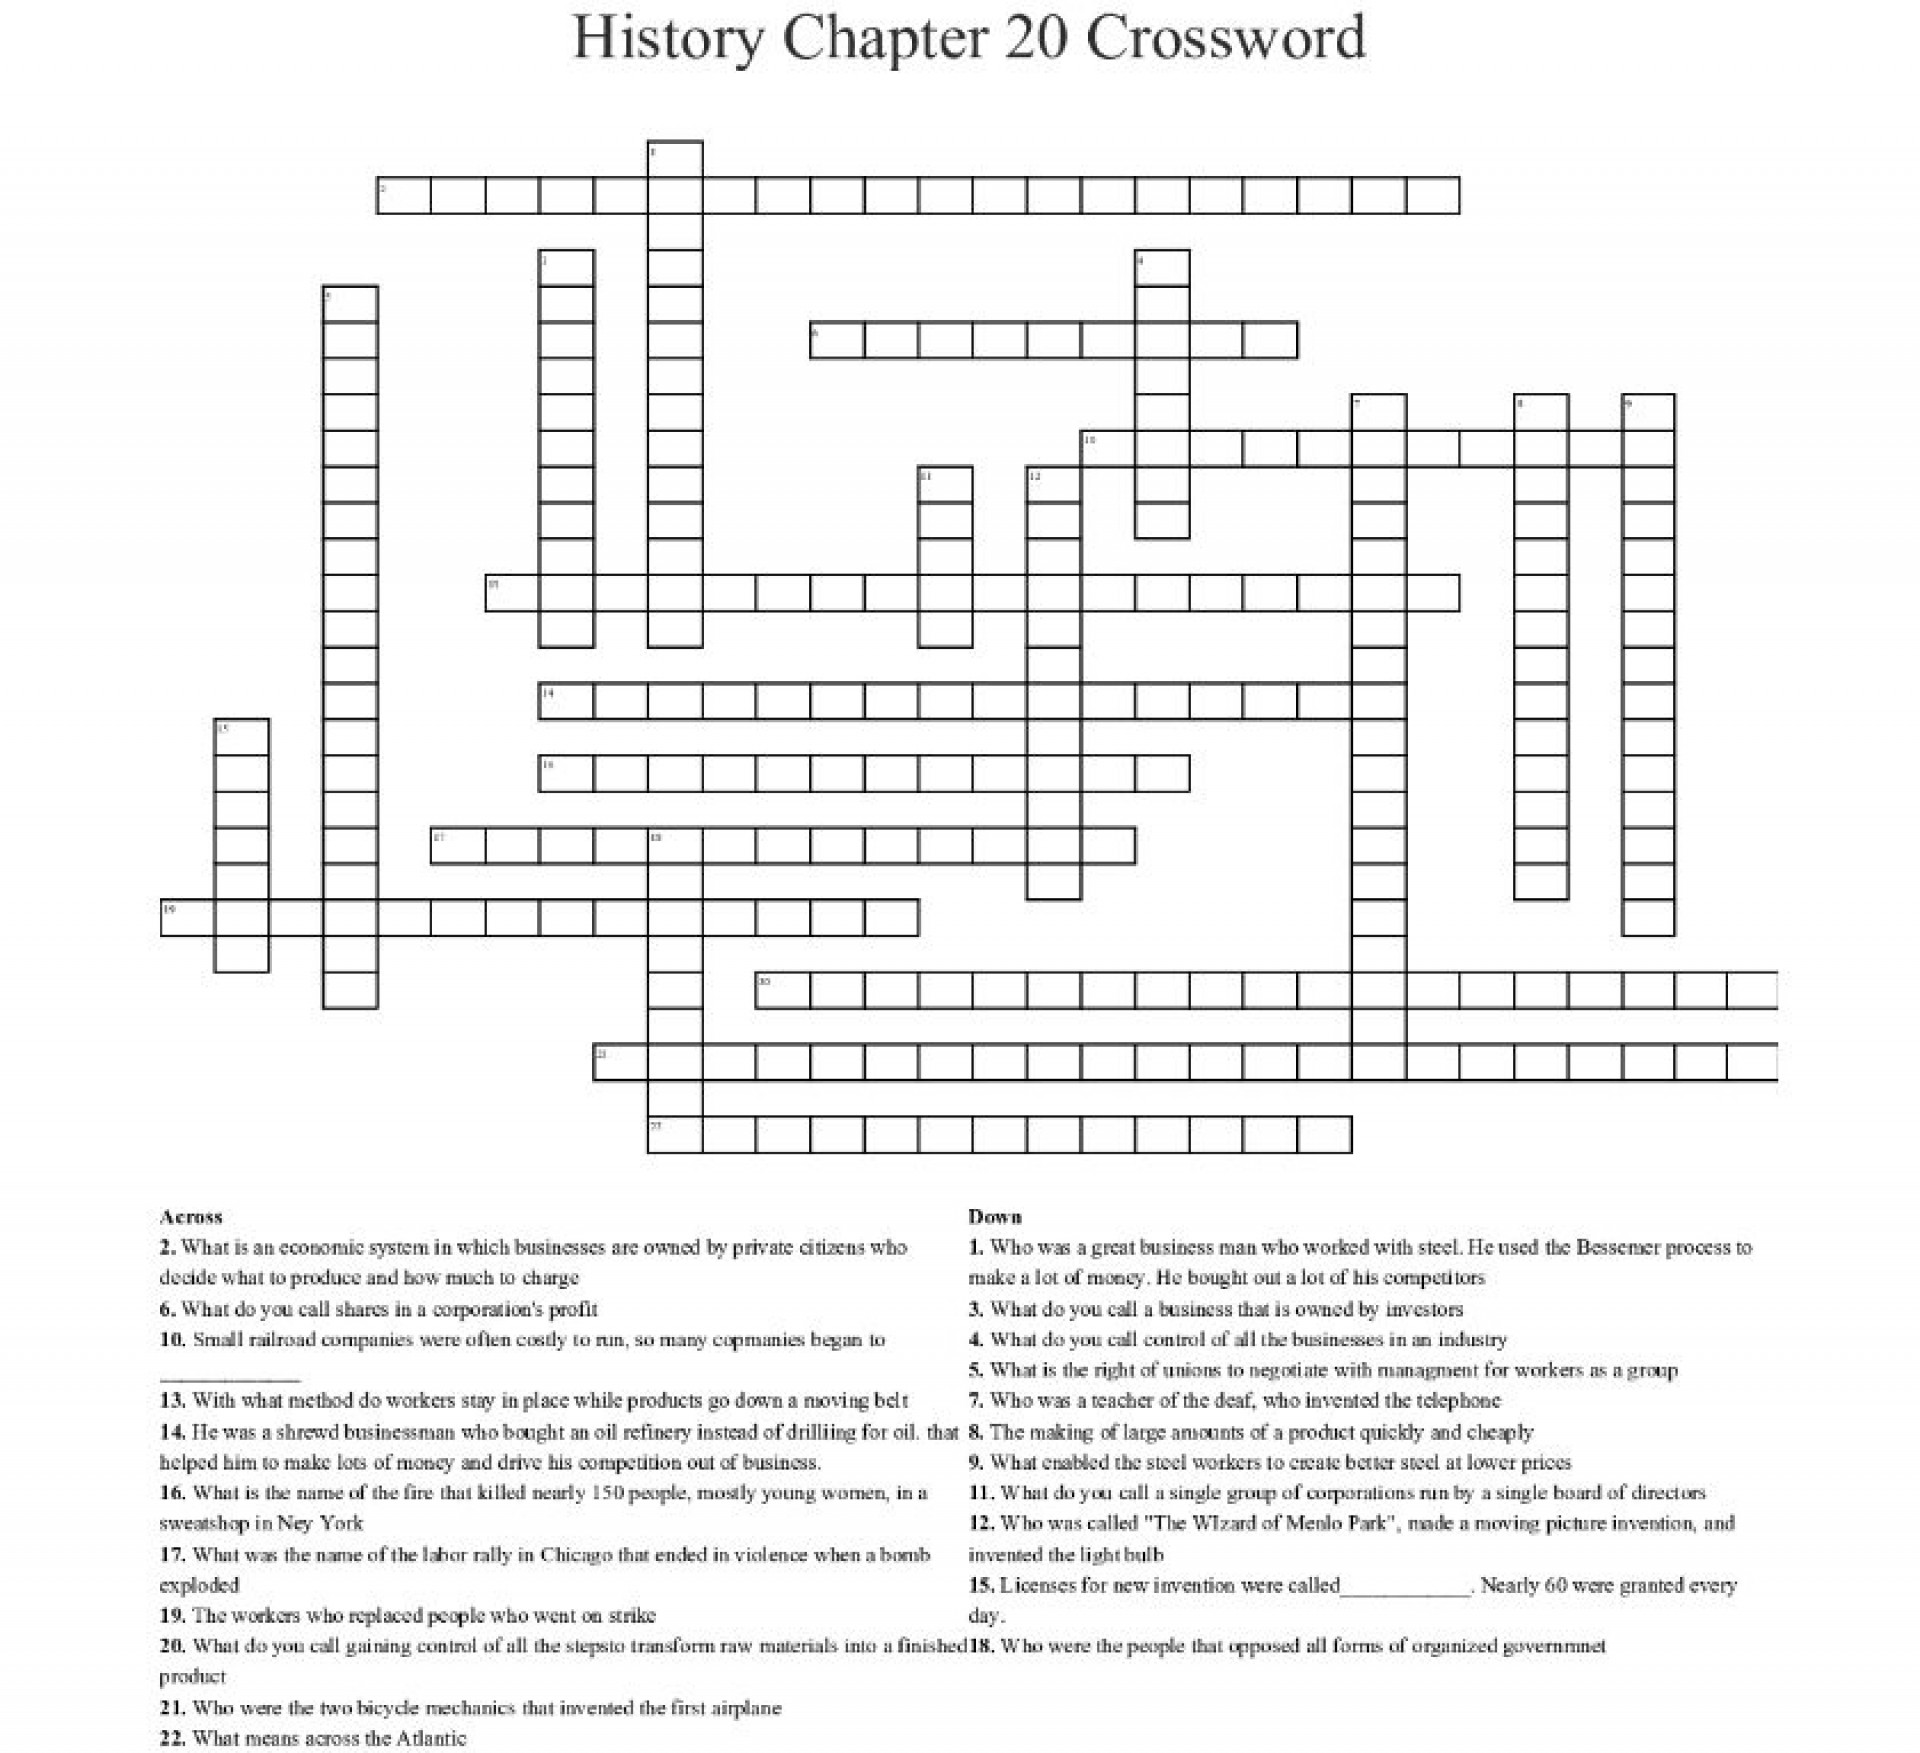 002 Frightening Prosperity Crossword Sample  Sound Clue Material1920